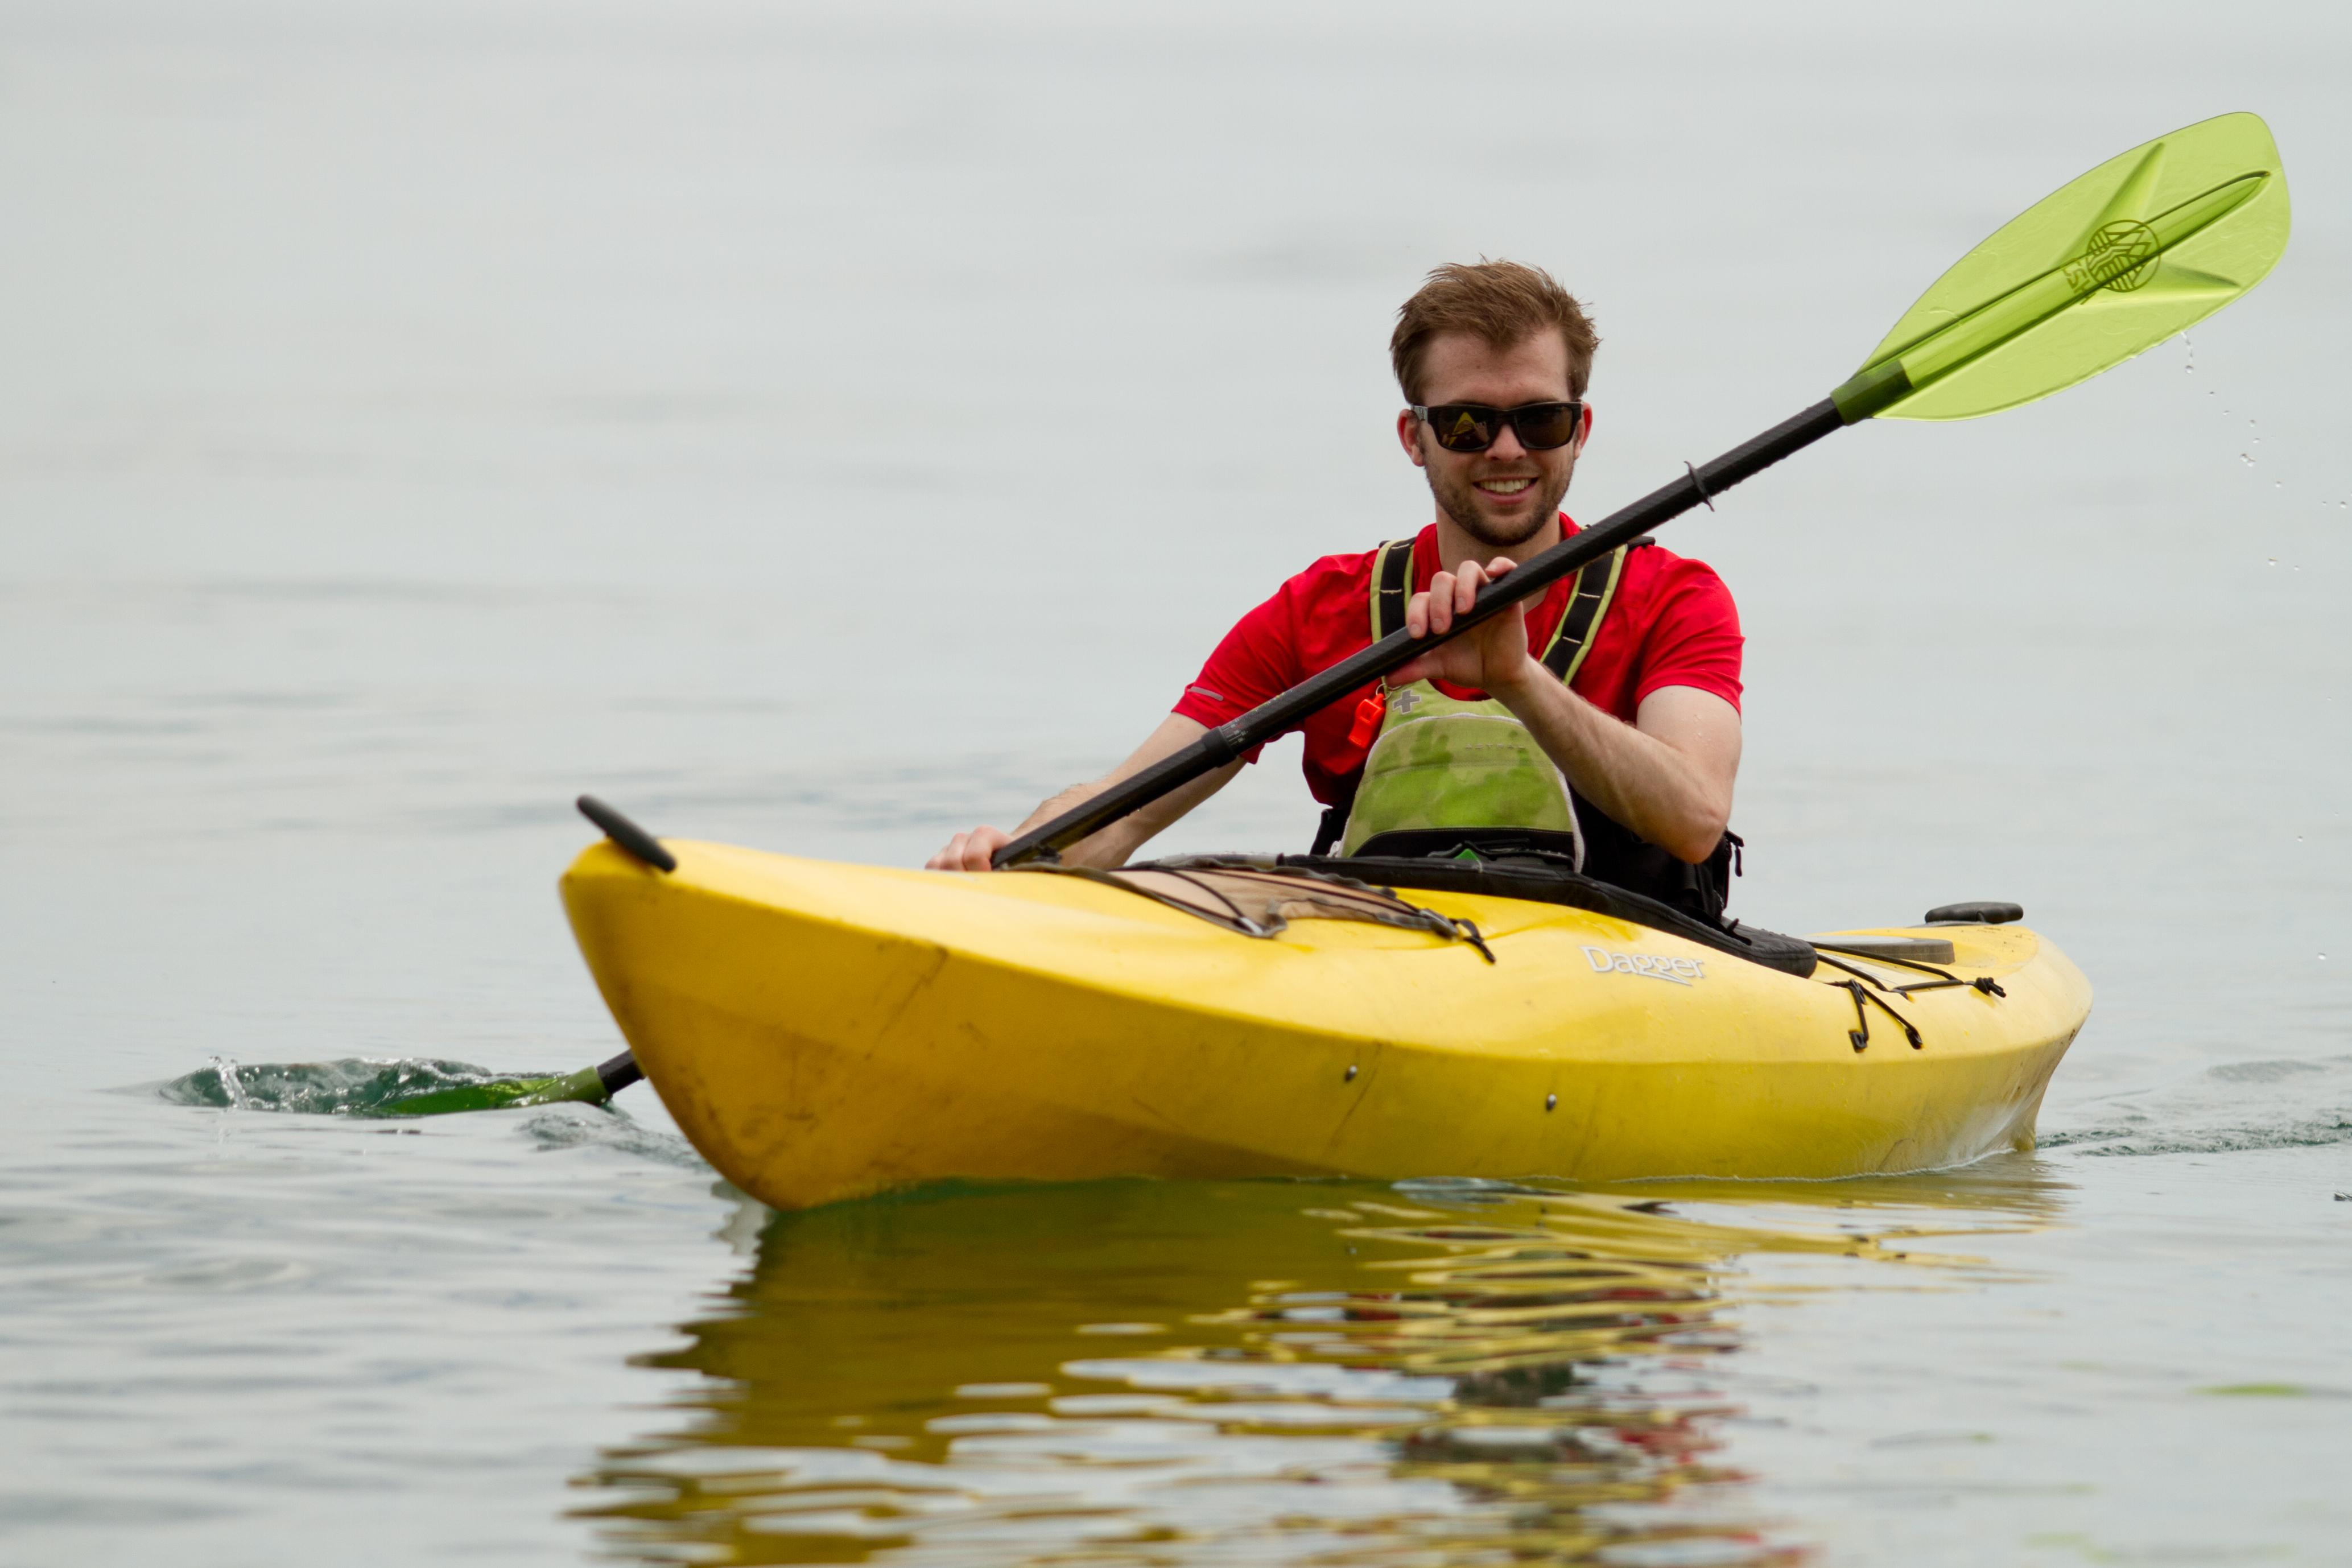 Kayak Paddles: Crystal X 2.0 Fast Ferrule by H2O Performance Paddles - Image 3667